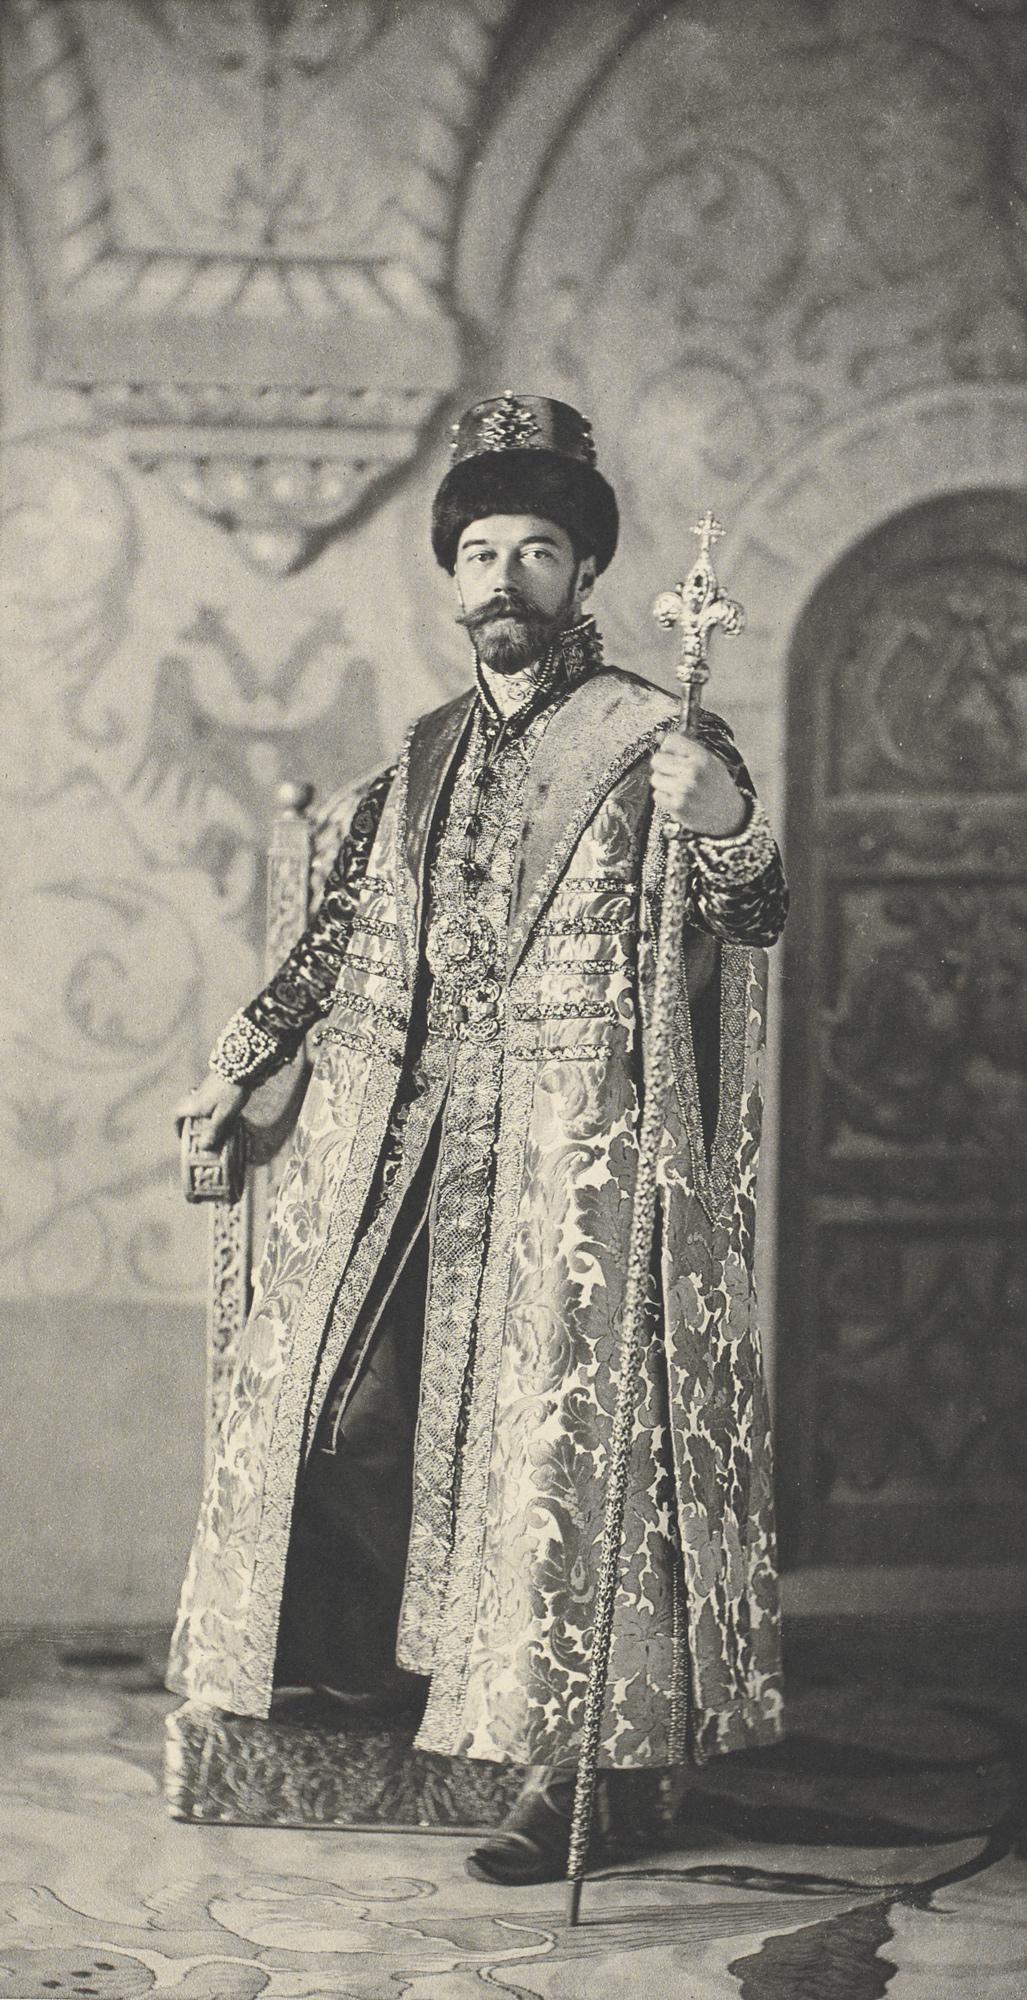 [✔] Empire de Russie Nicholasii_winterball_t00040-67-cropped